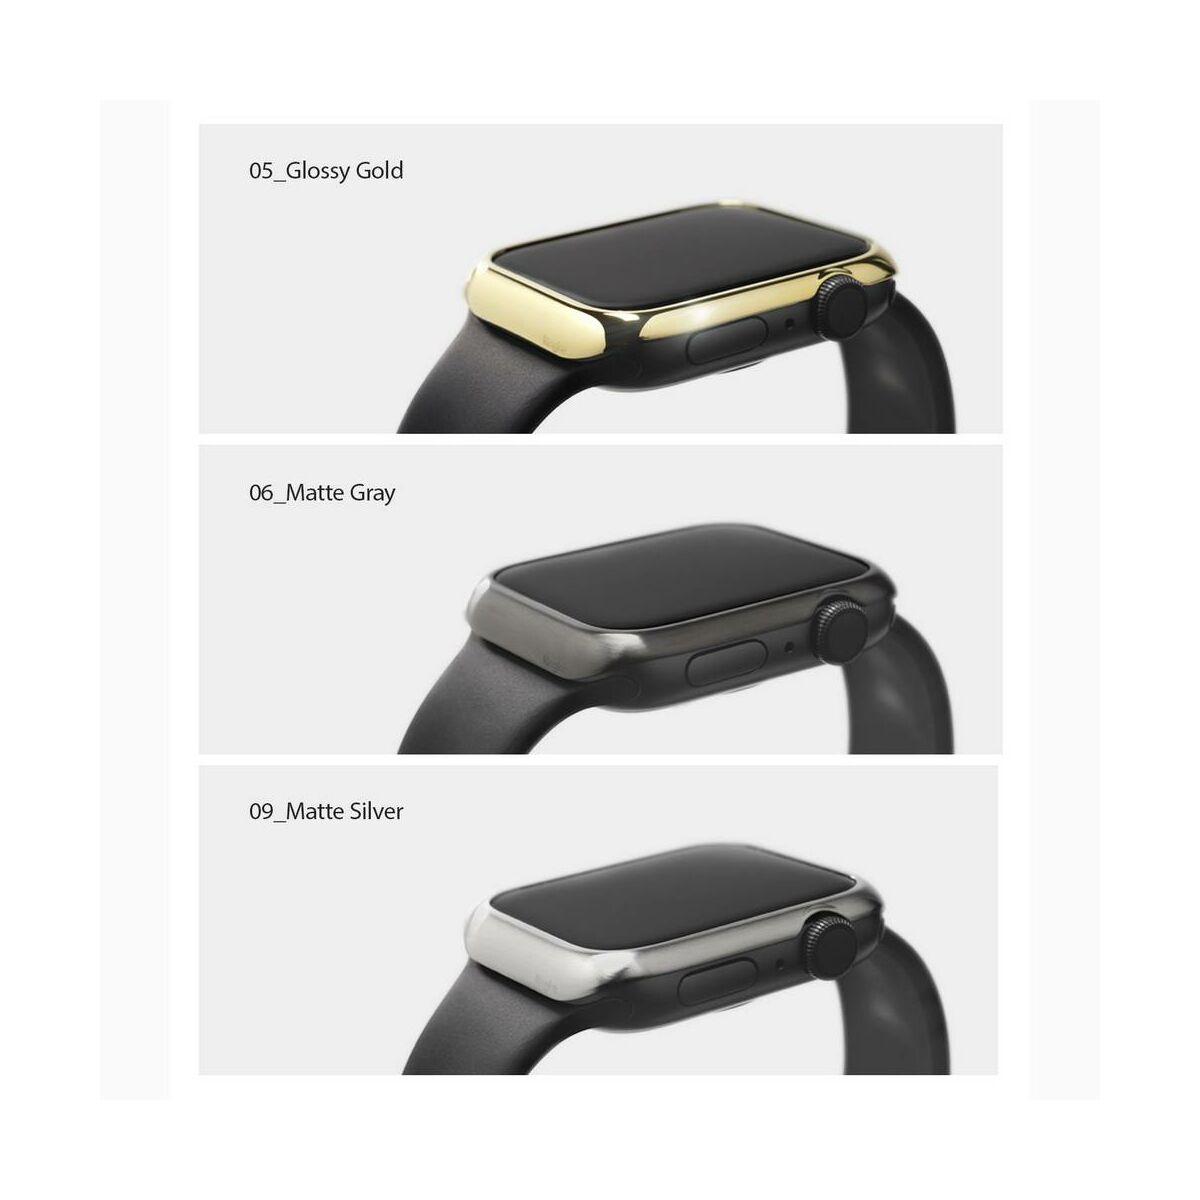 Ringke Apple Watch kijelzővédő  acélkeret, Bezel  Styling 40mm - AW4-40-06 (Stainless Steel), Szürke